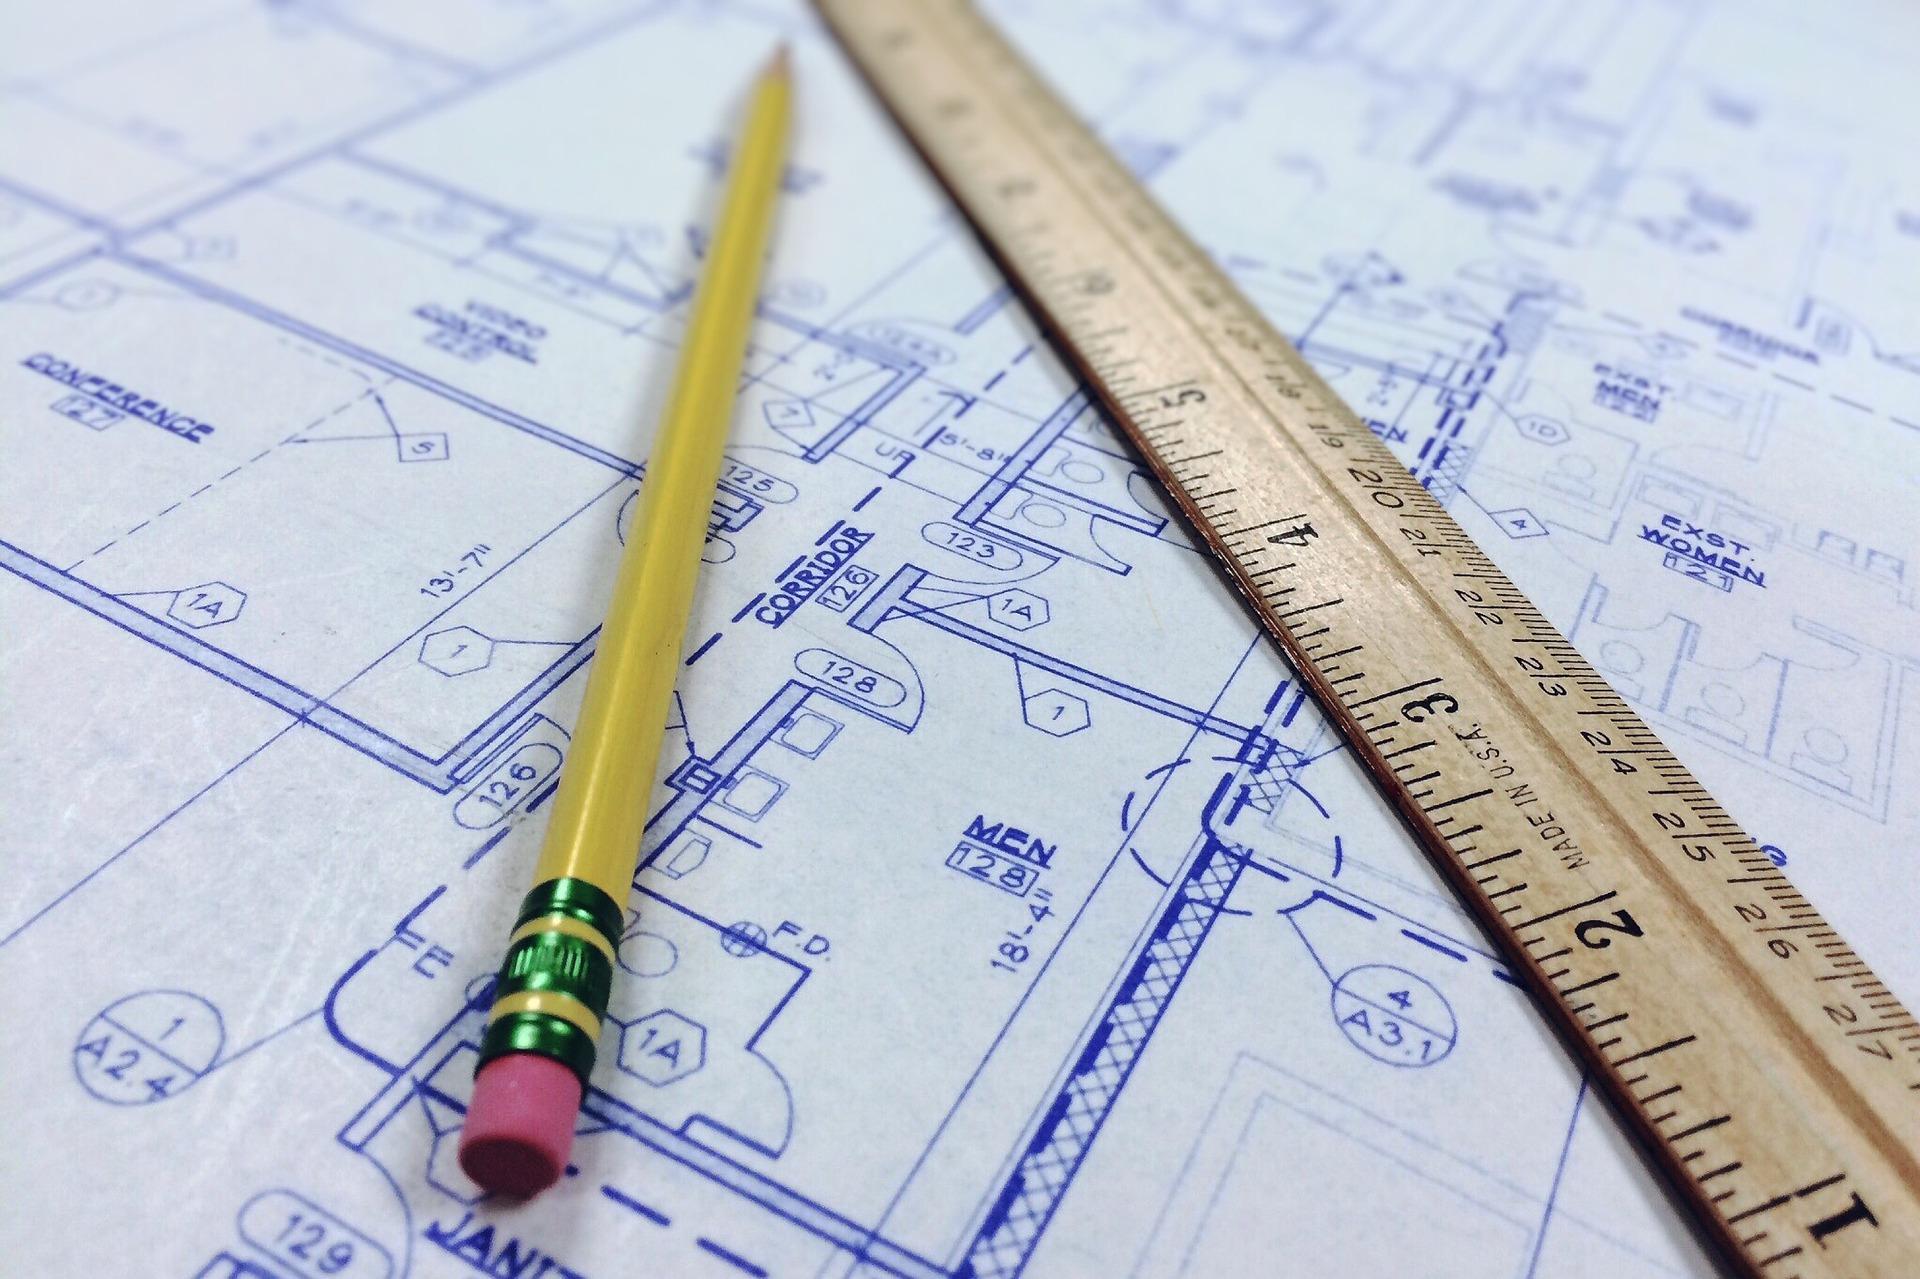 Технический план на нежилые строения (бани, сараи и т.п.)